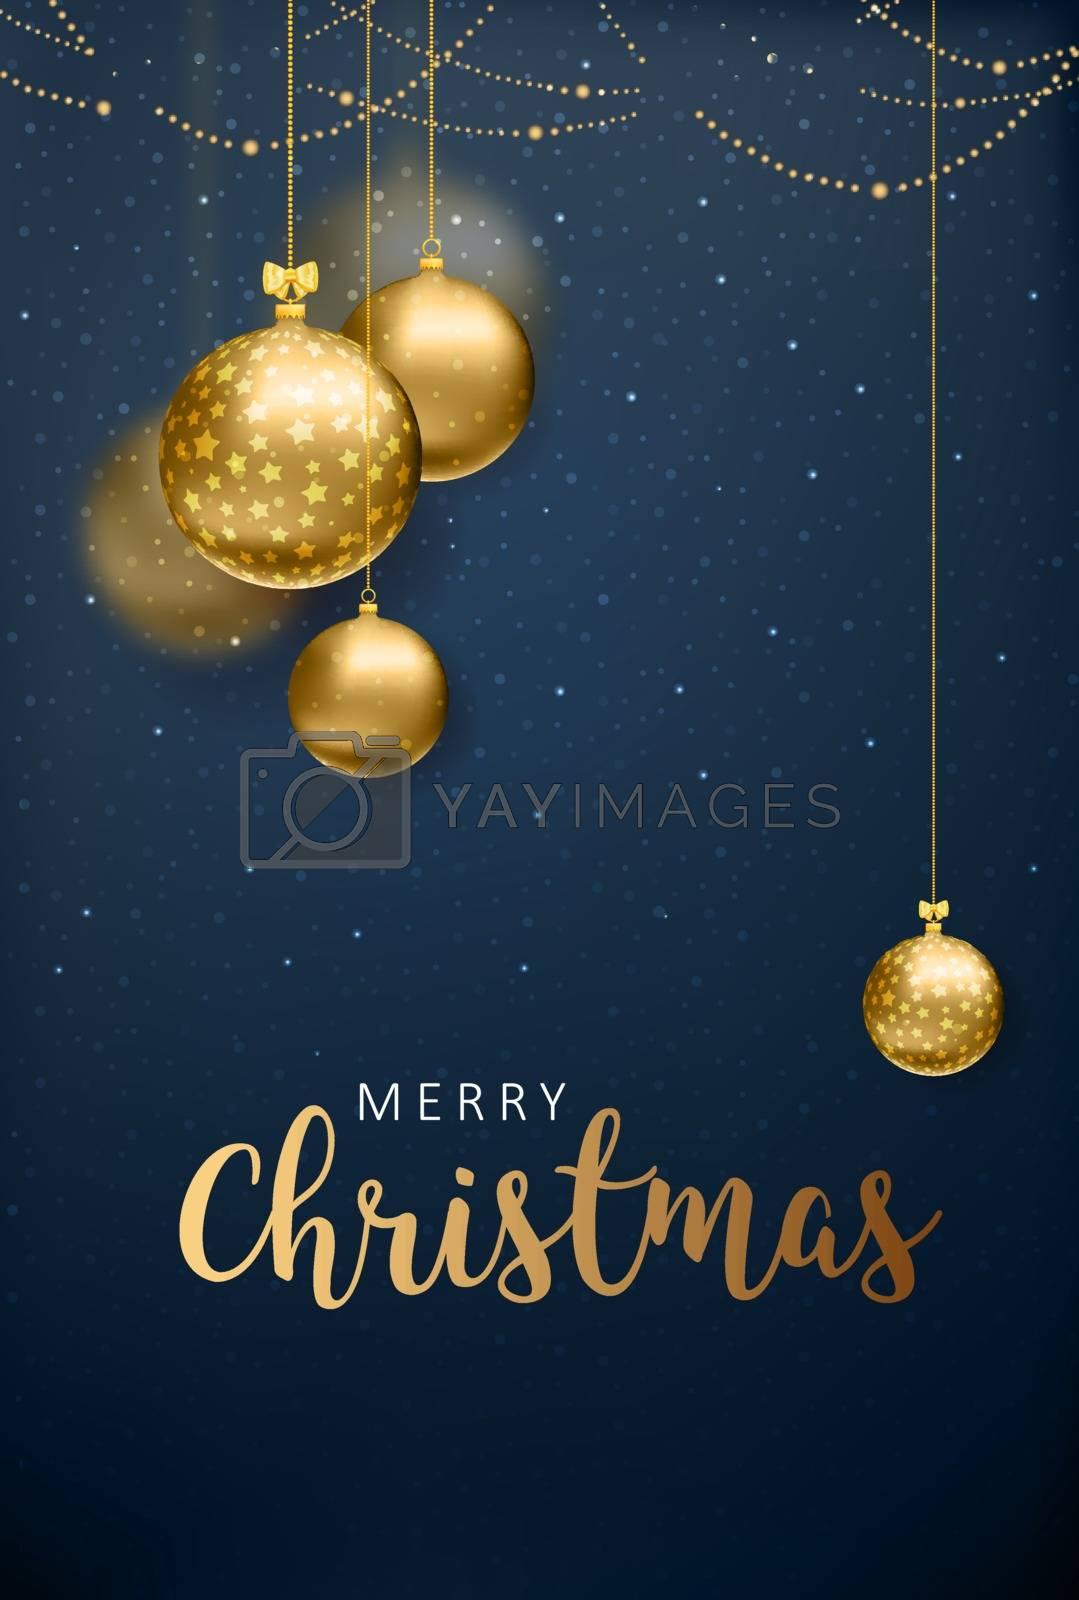 Vector illustration of Golden balls background with sparkling